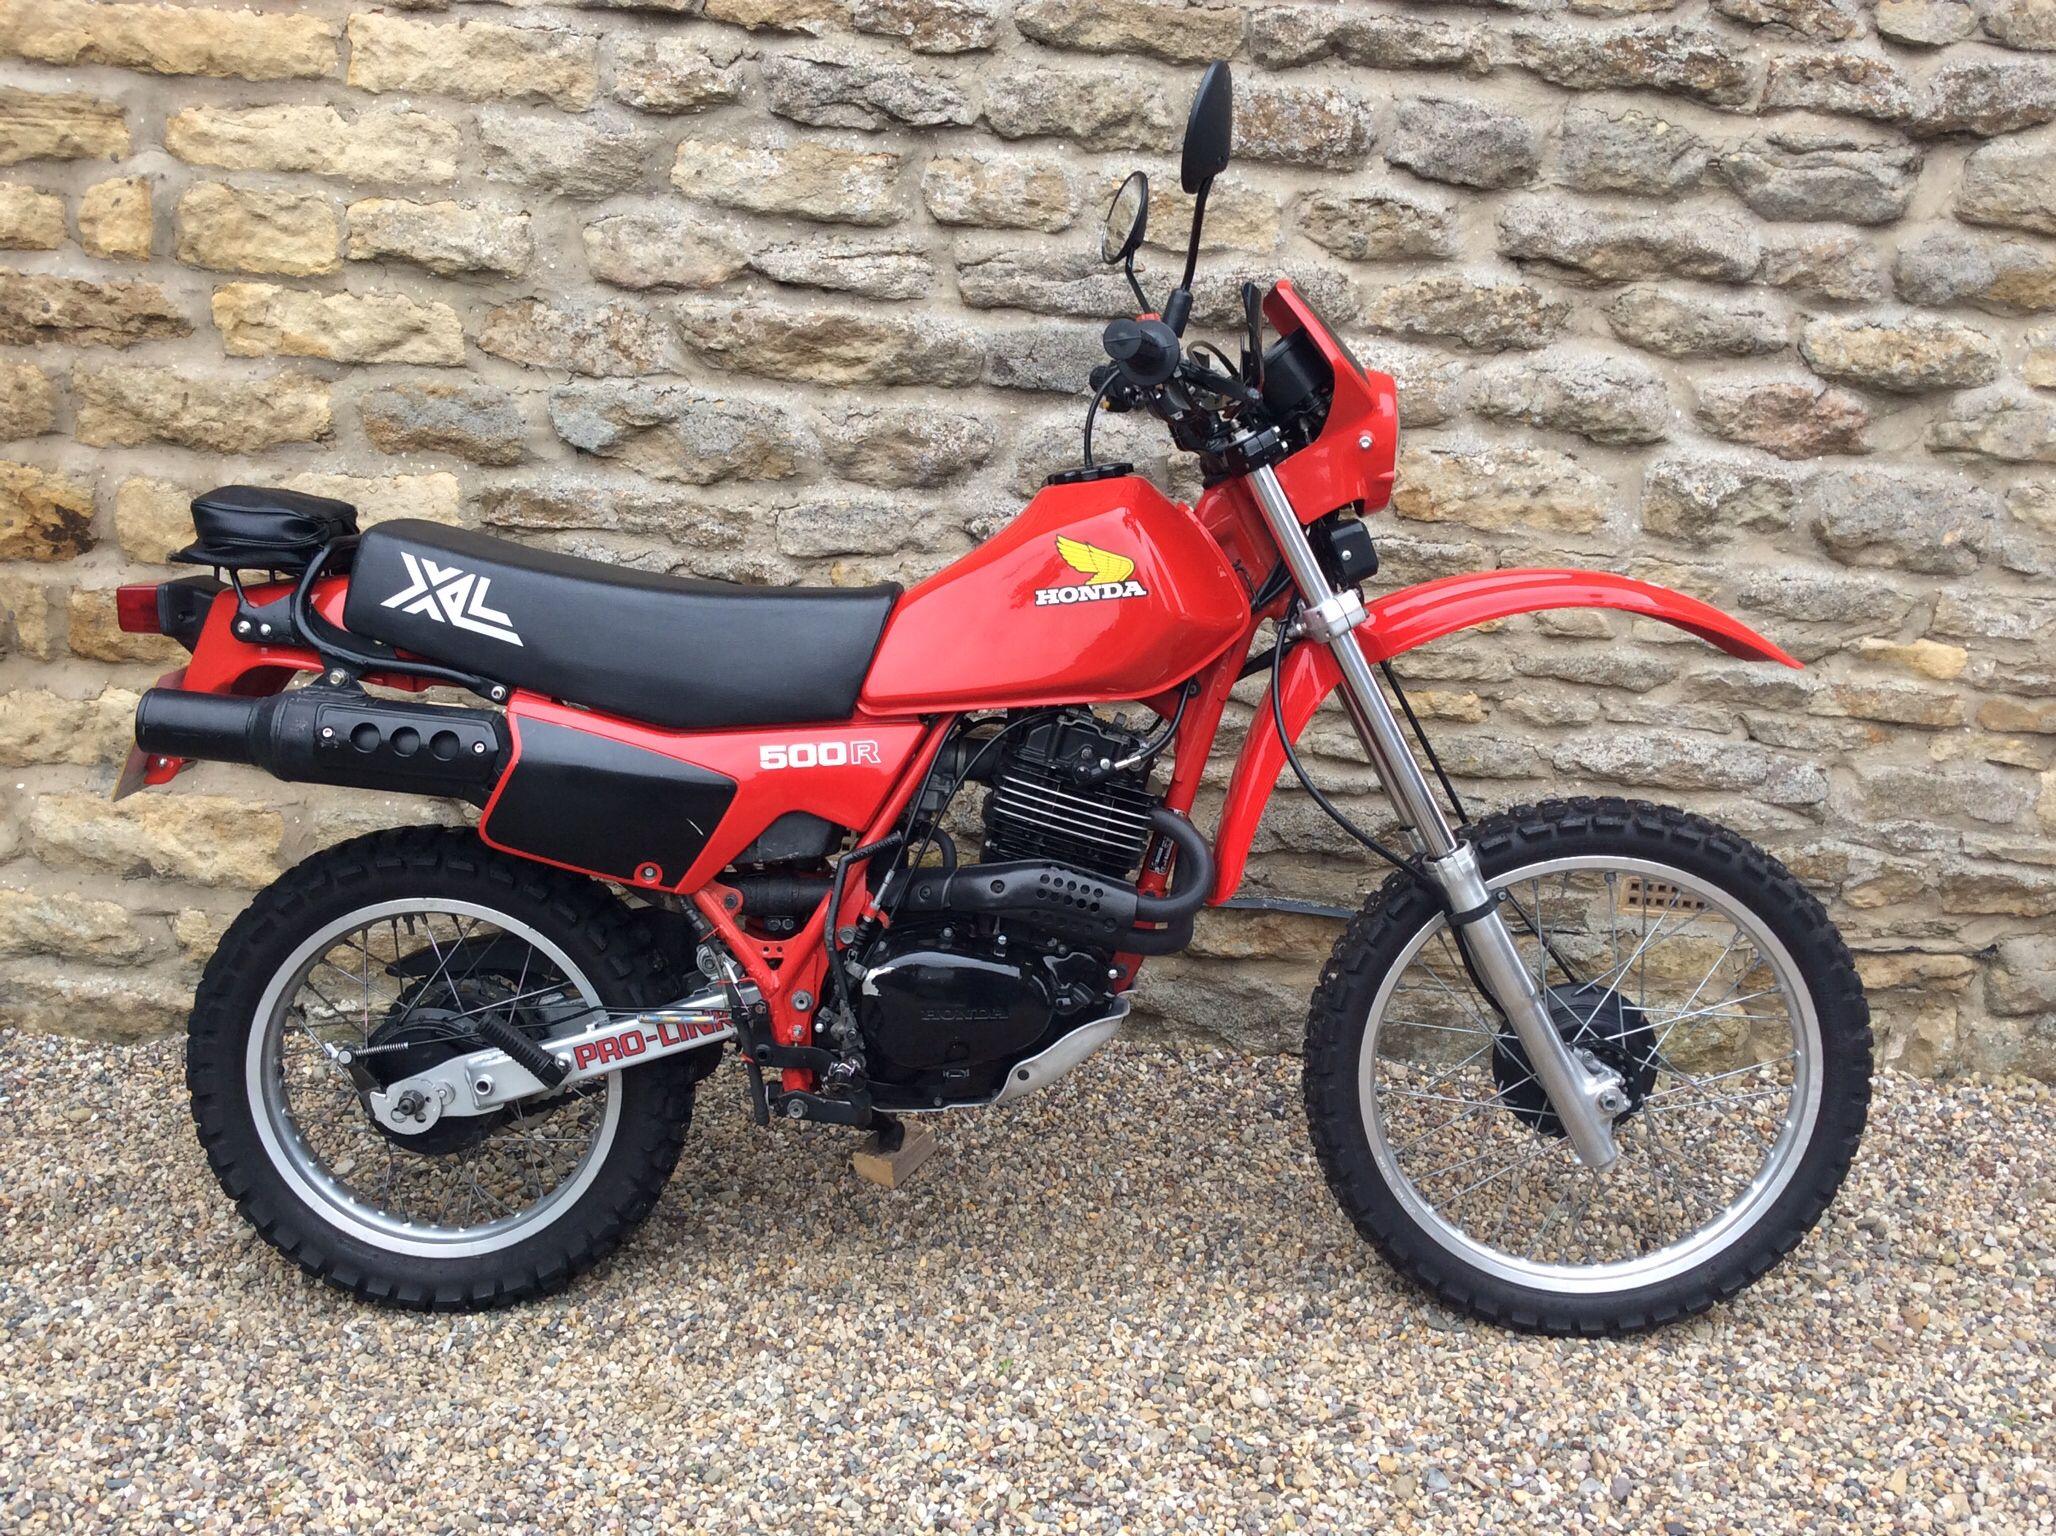 1983 Honda XL500R